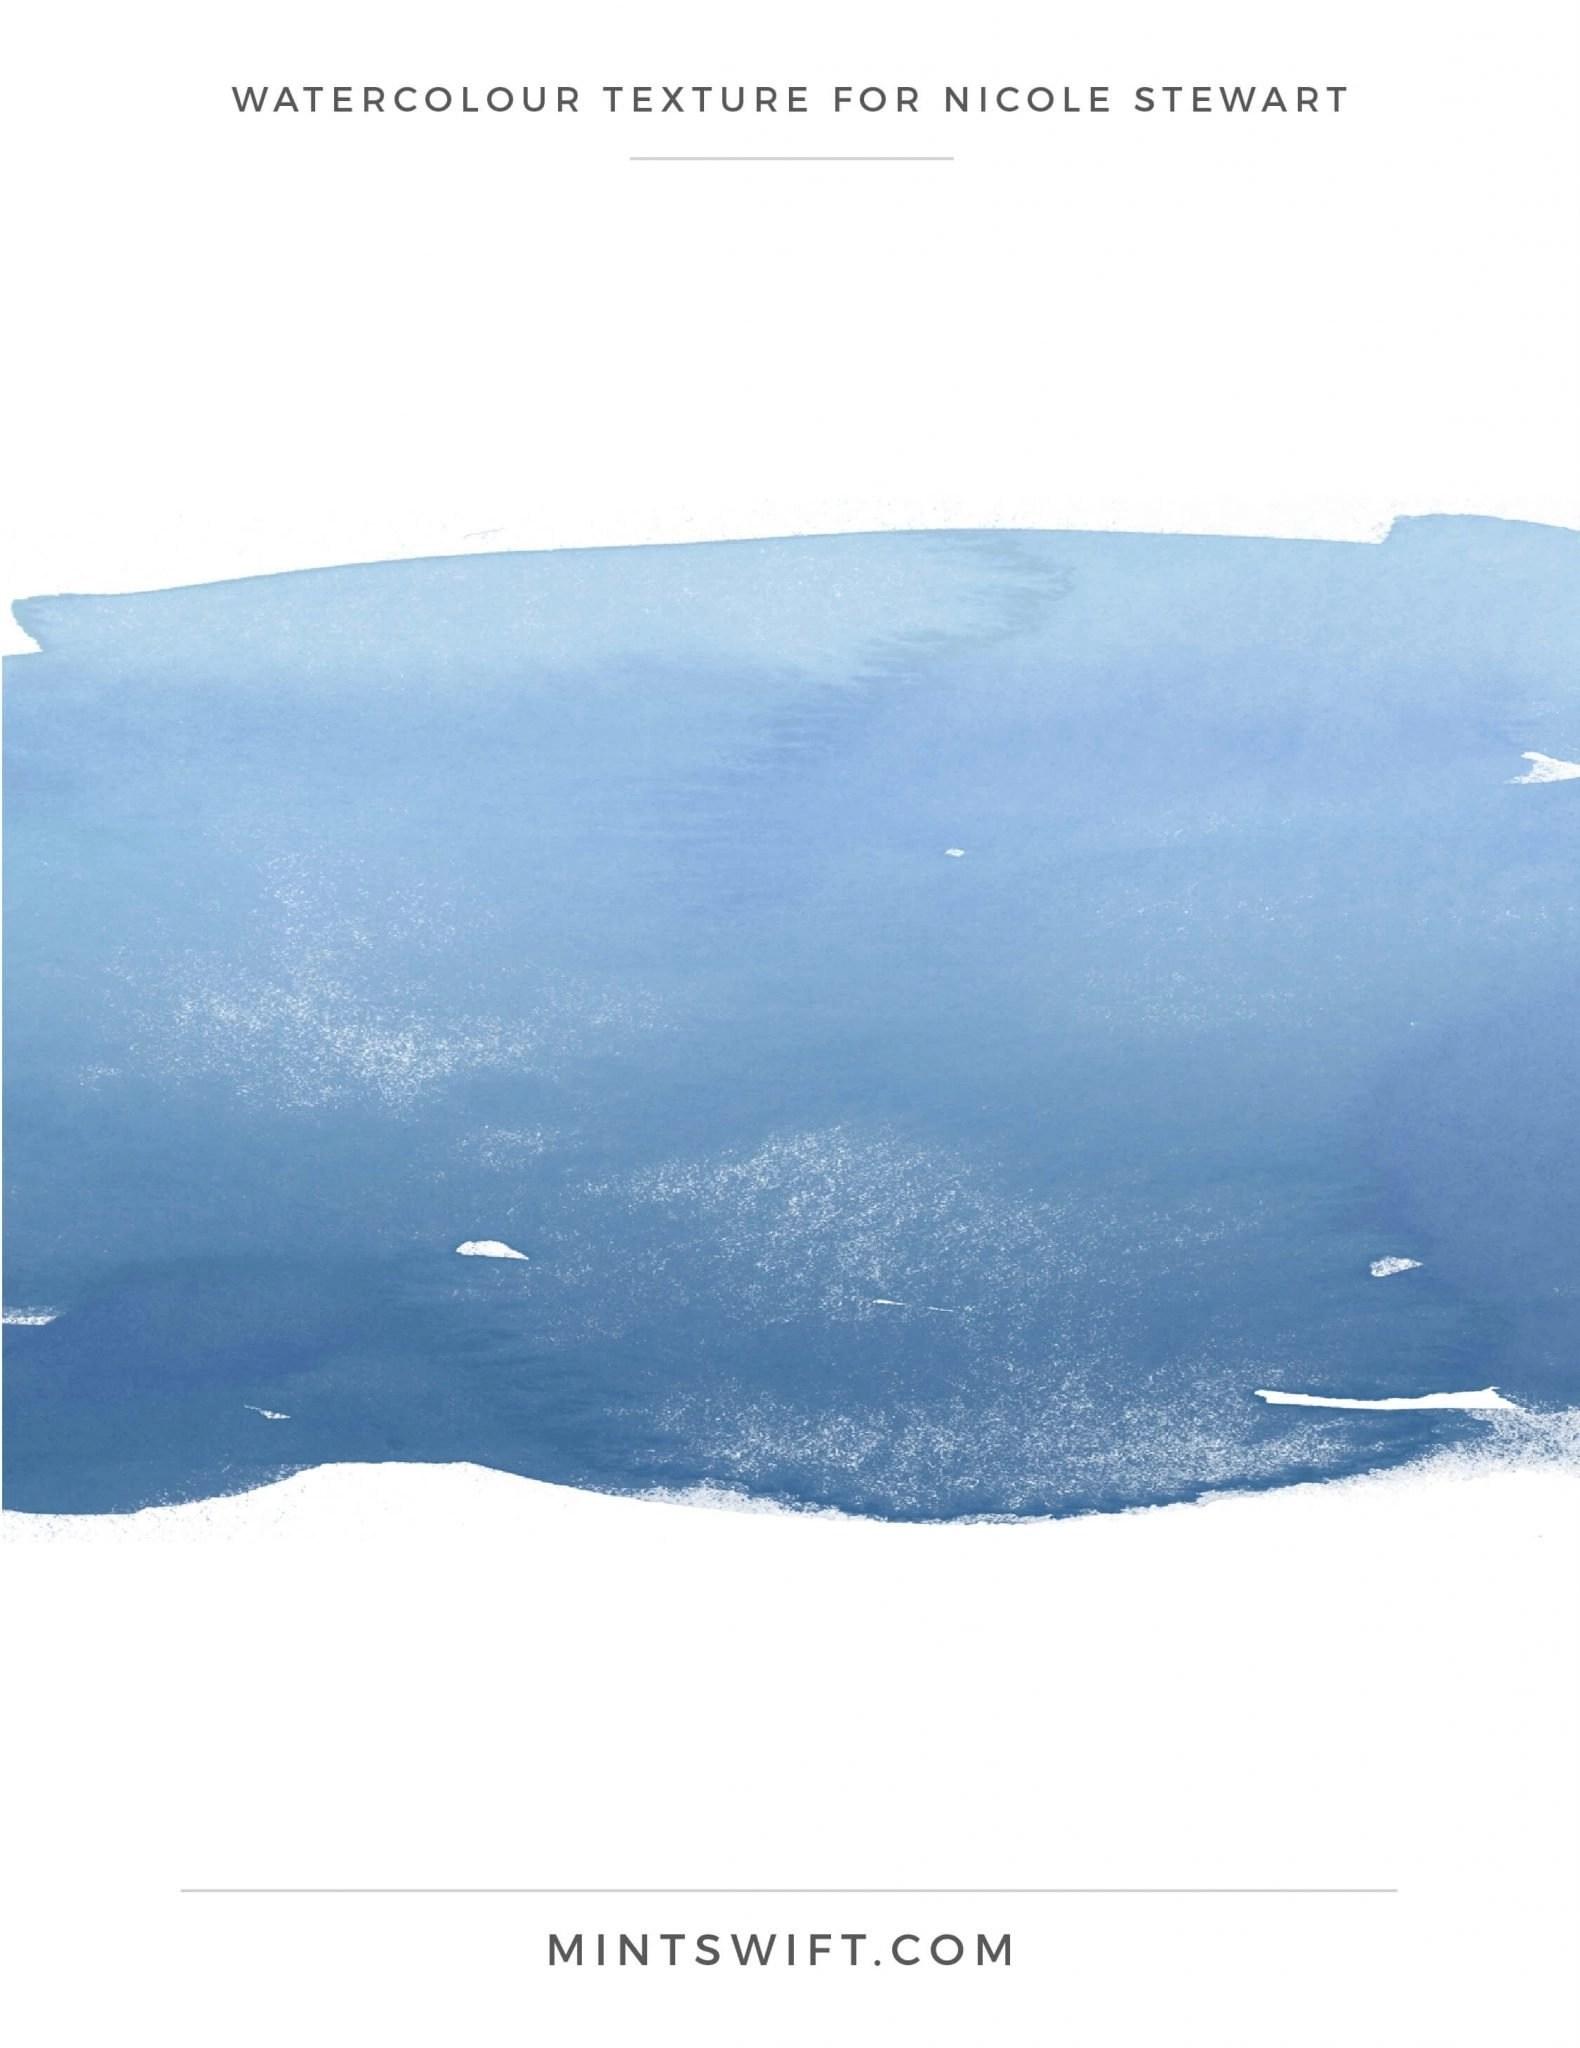 Nicole Stewart - Watercolour Texture - Brand Design Package - MintSwift